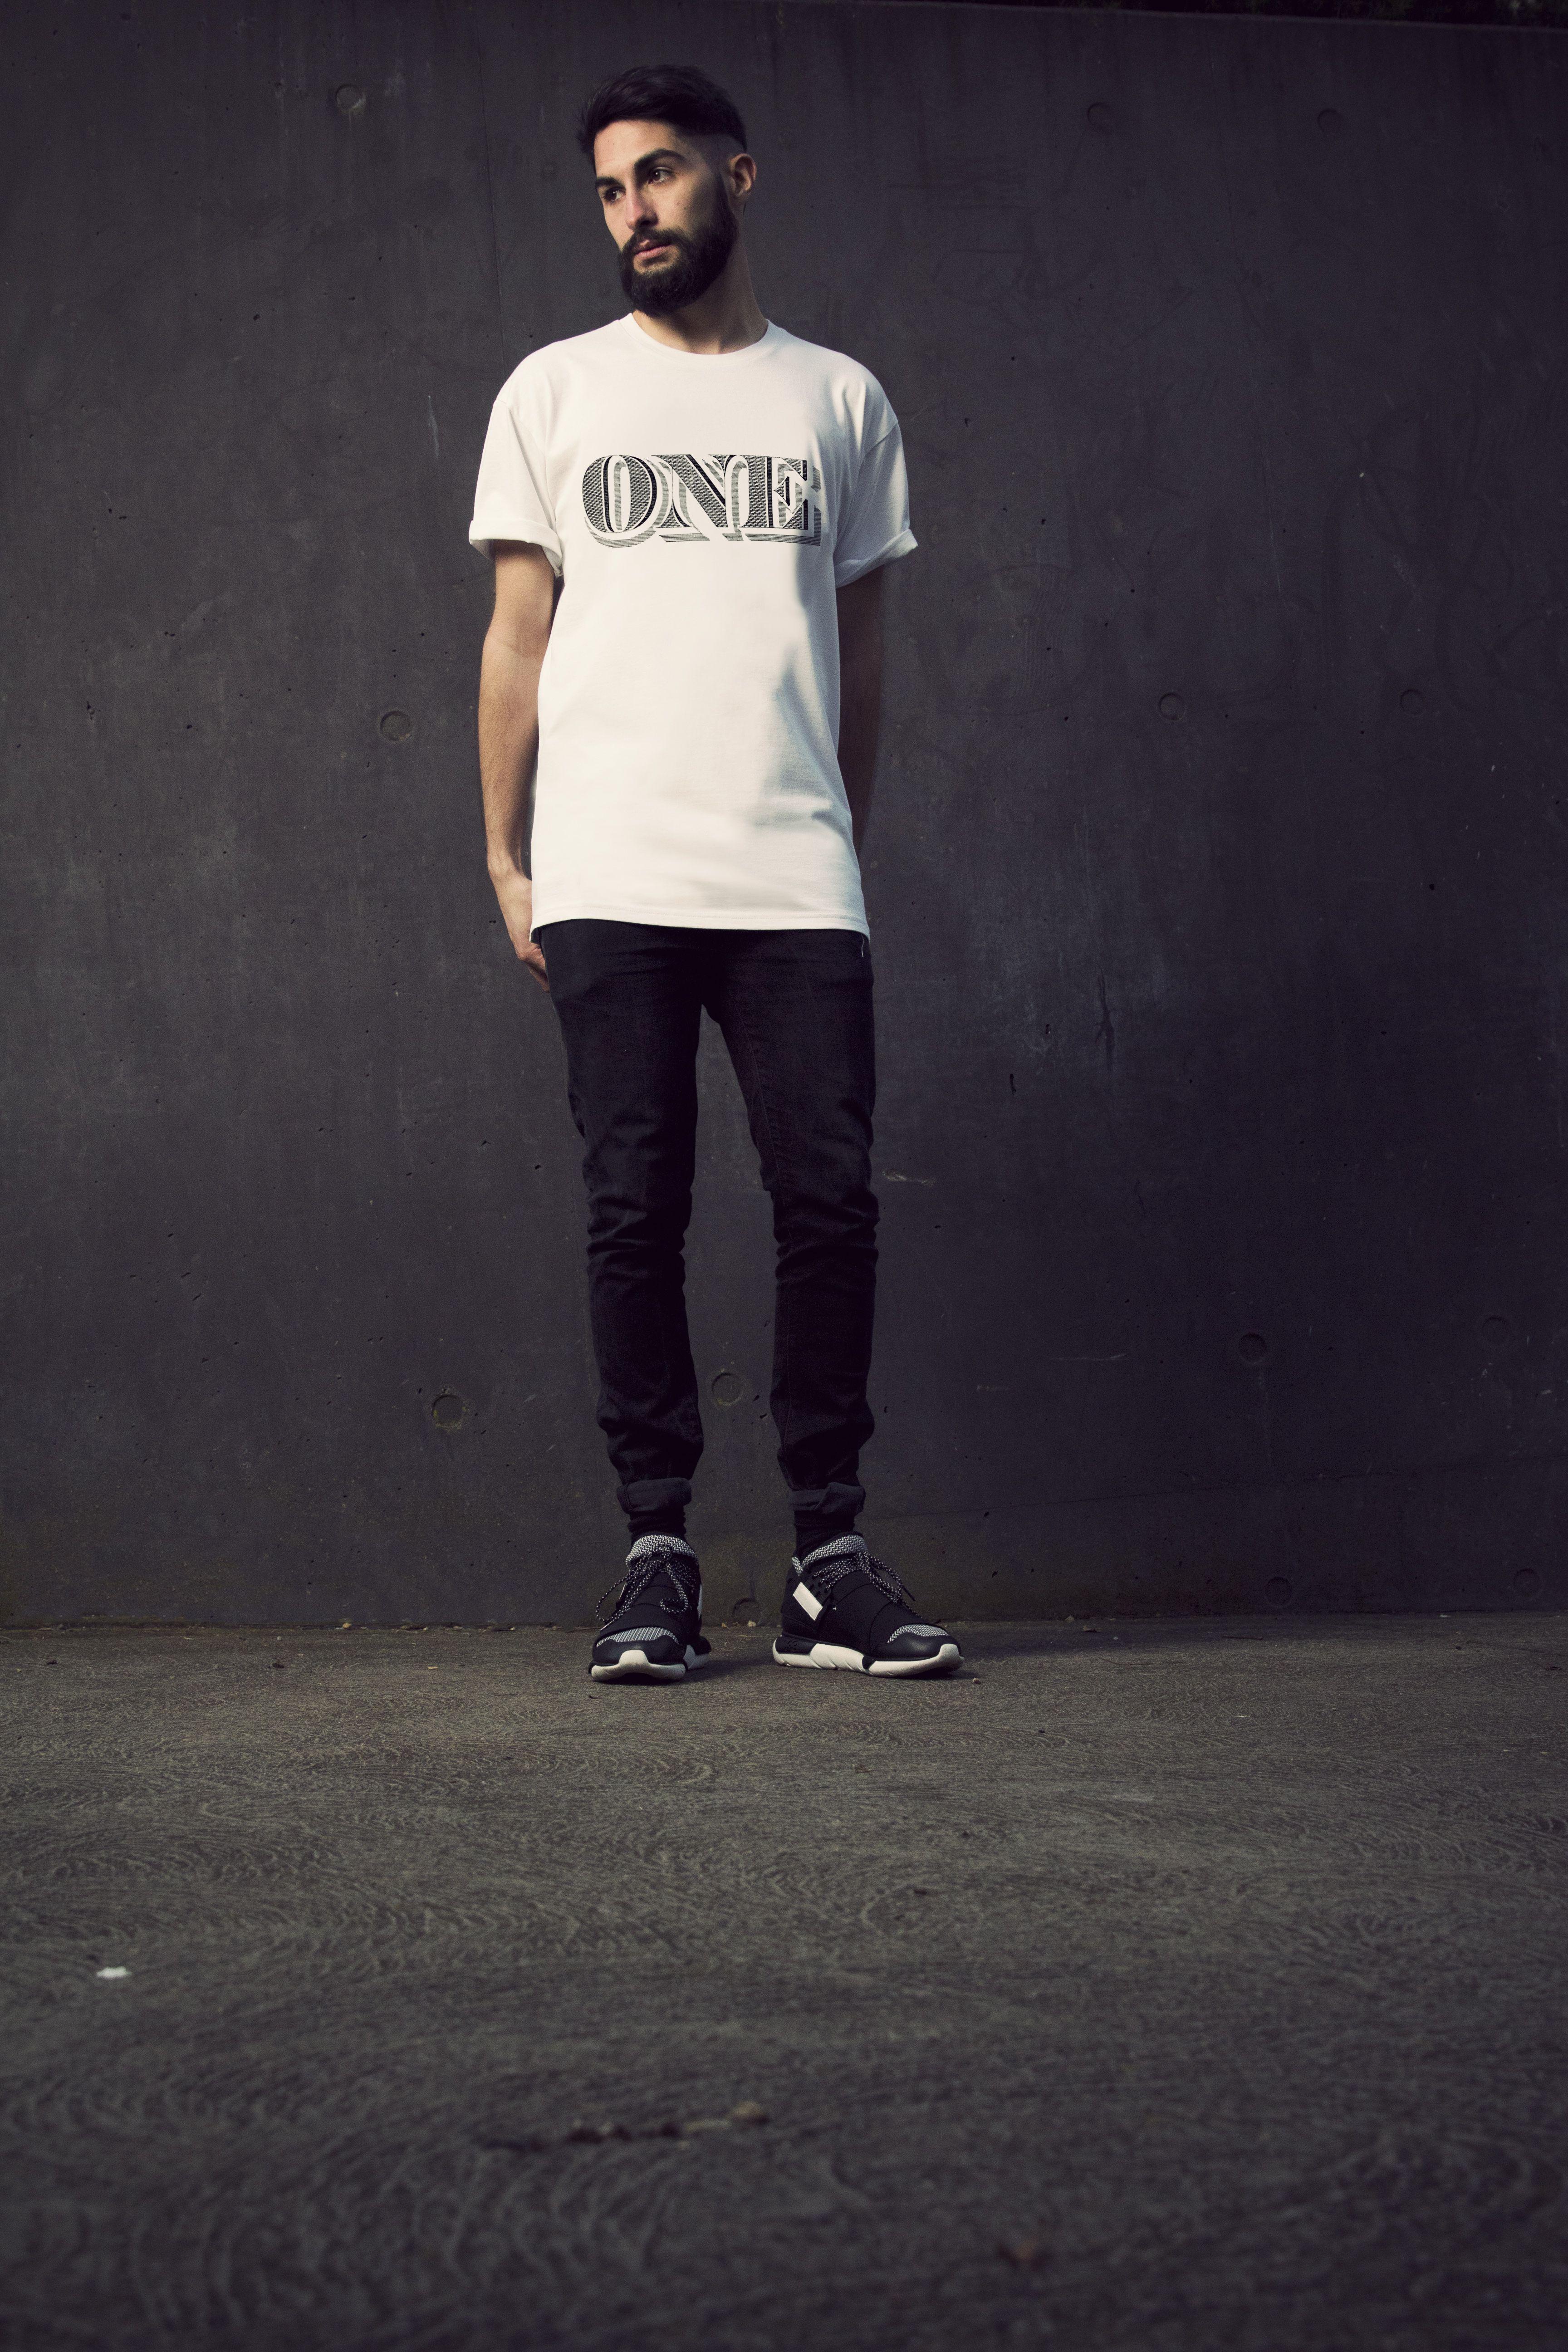 Shirt design melbourne - Www Okuhstudios Com Surreal Fashion Streetwear Monochrome 90s